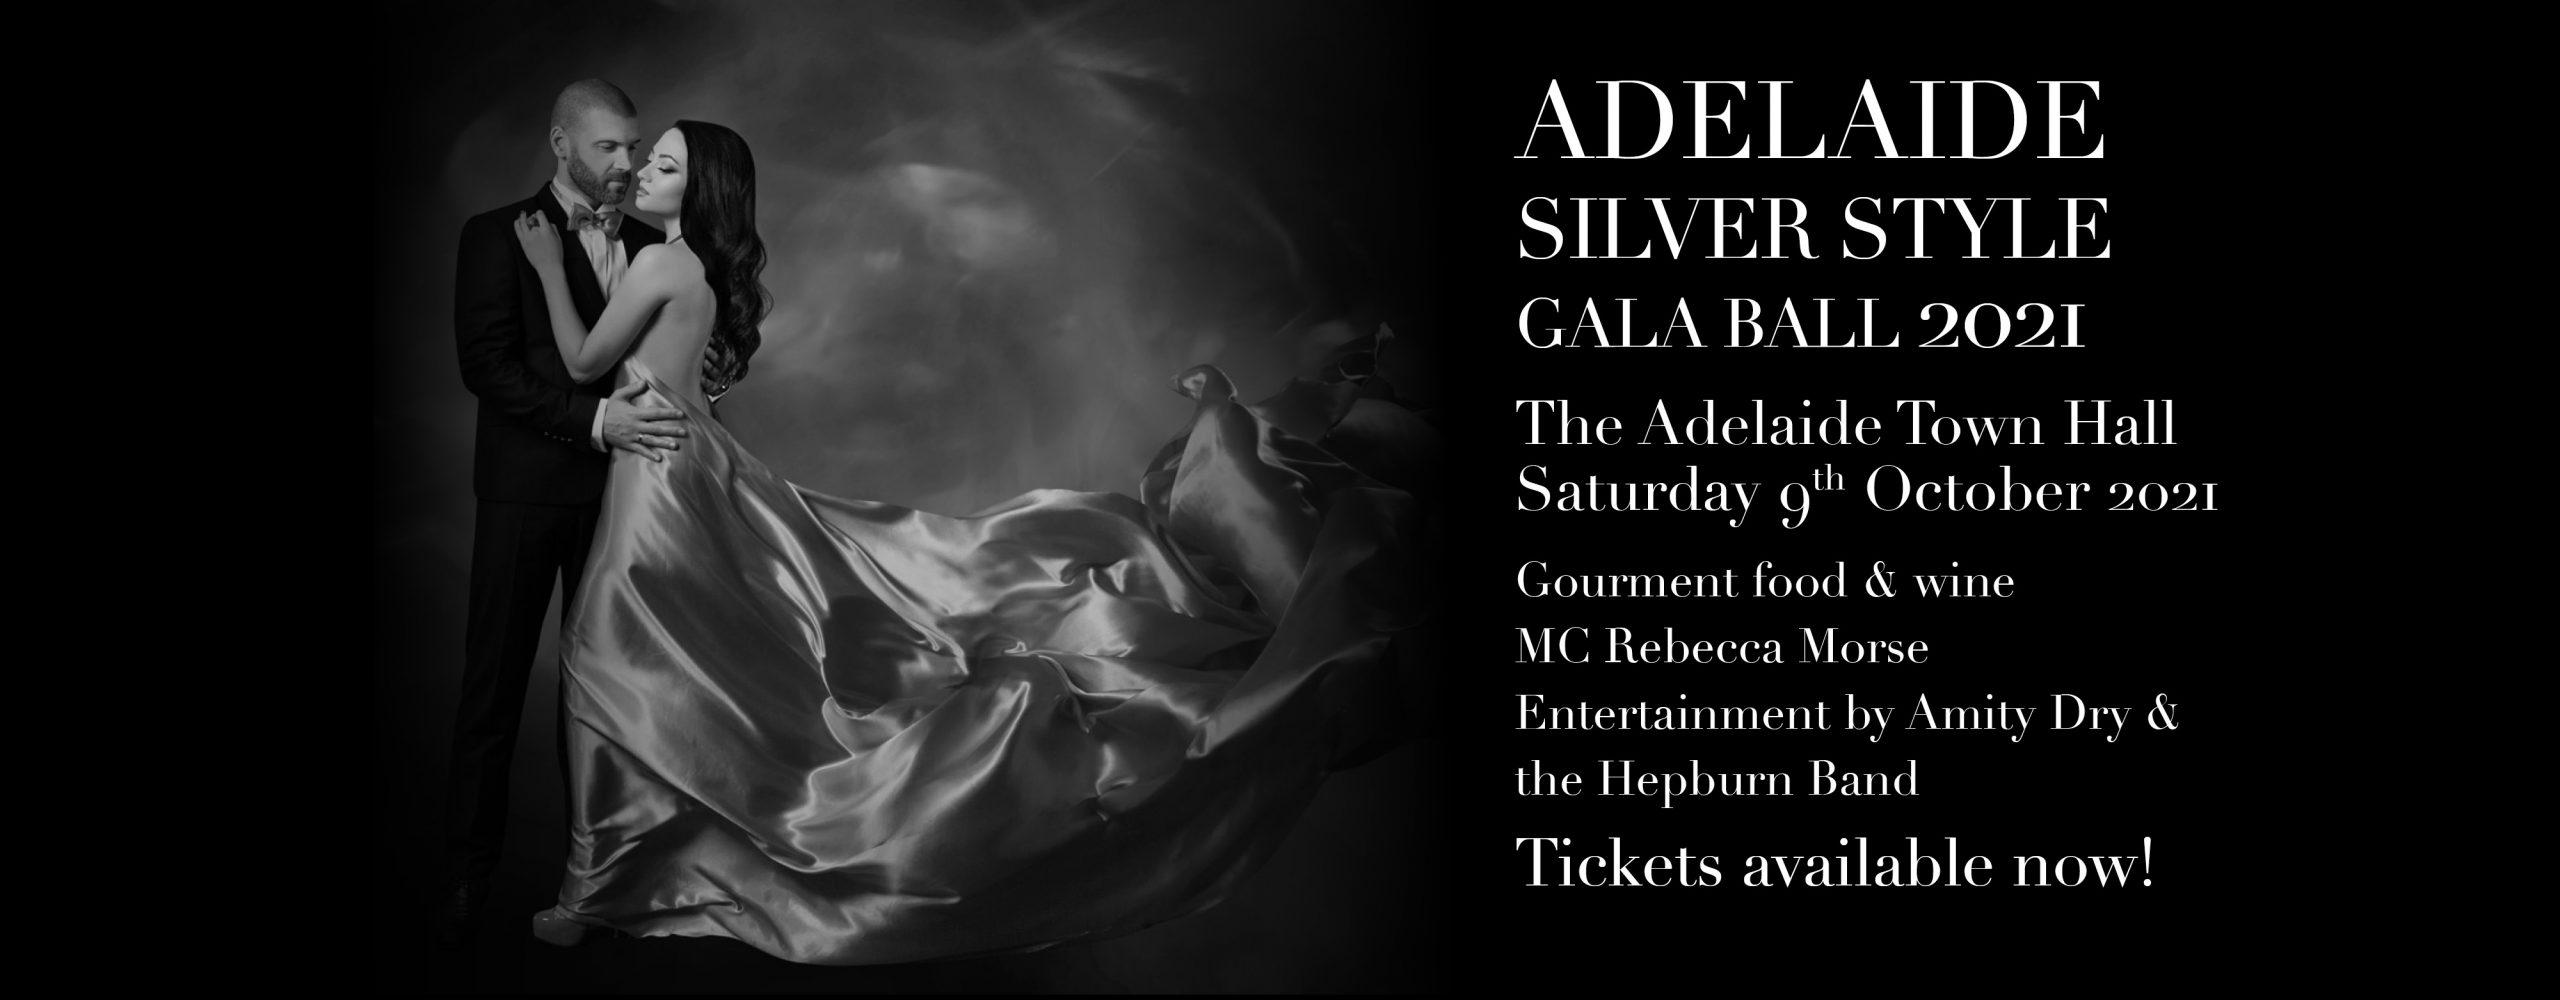 Adelaide Silver Style Gala Ball 2021